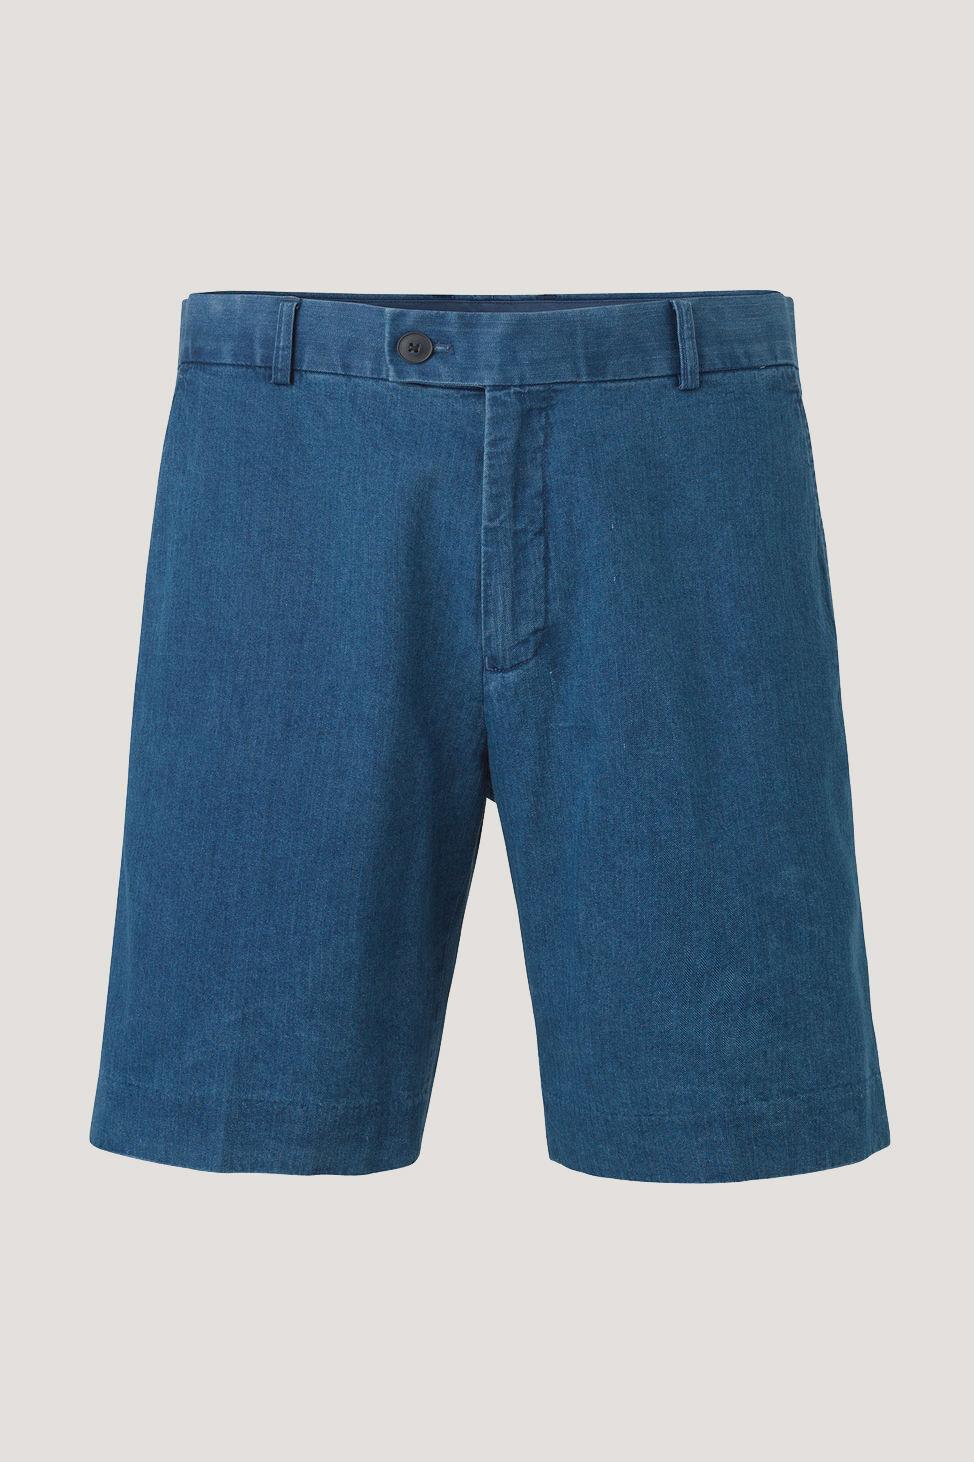 Laurent shorts 9970, DENIM BLUE